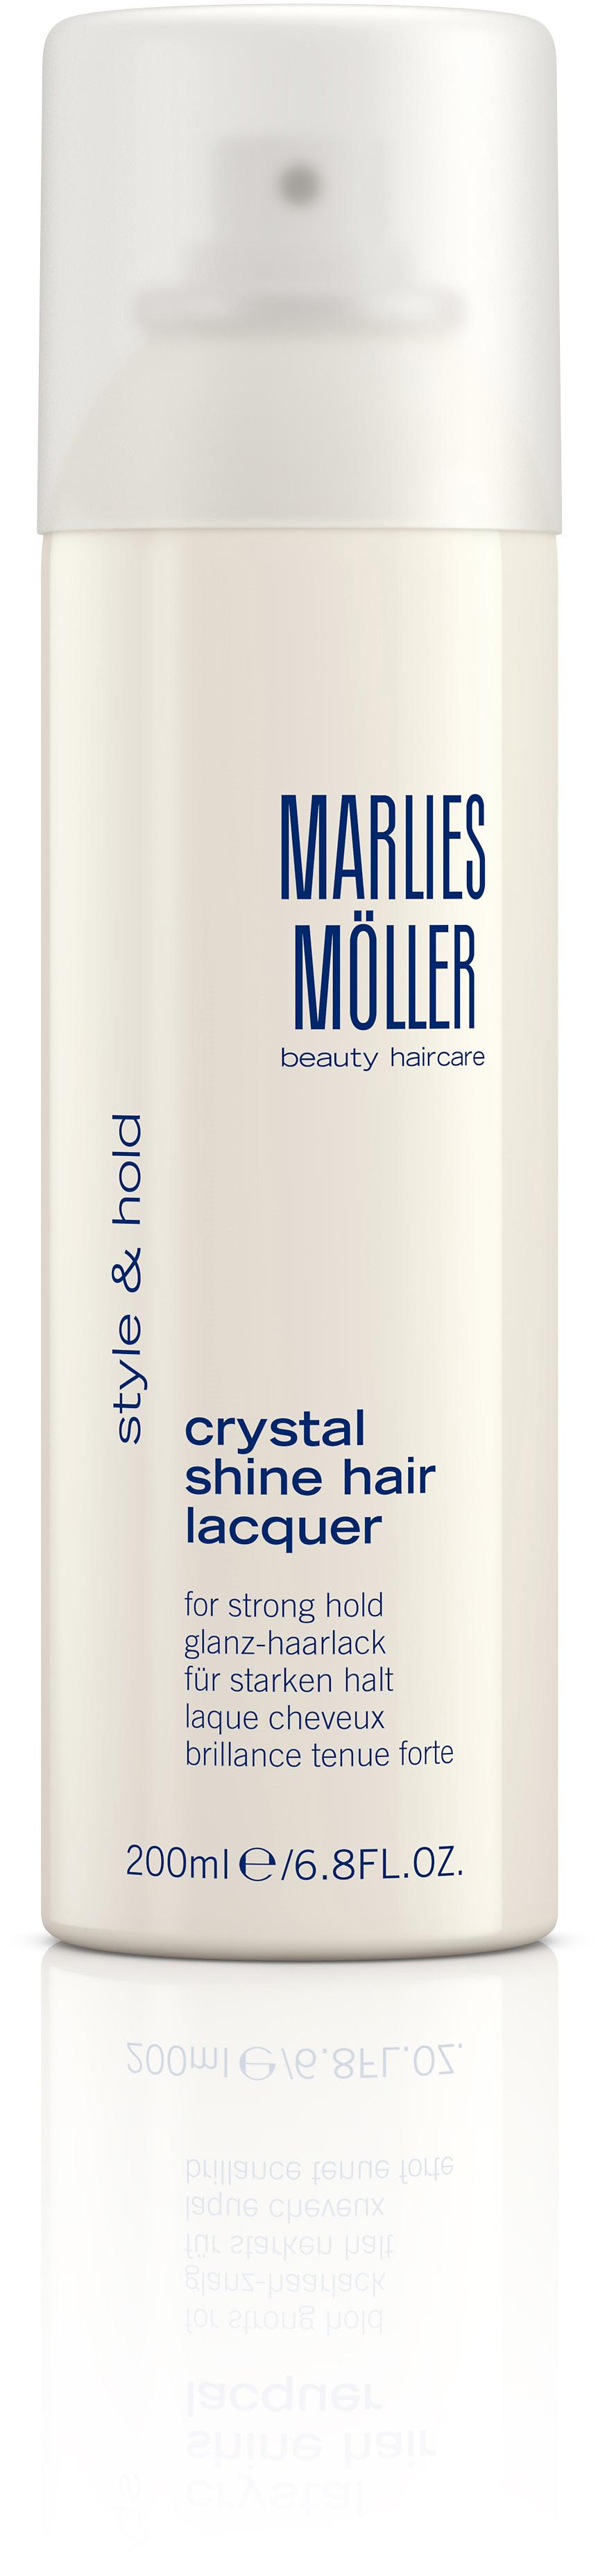 Marlies Möller Style Crys Sh Hair Lacquer 200 ml